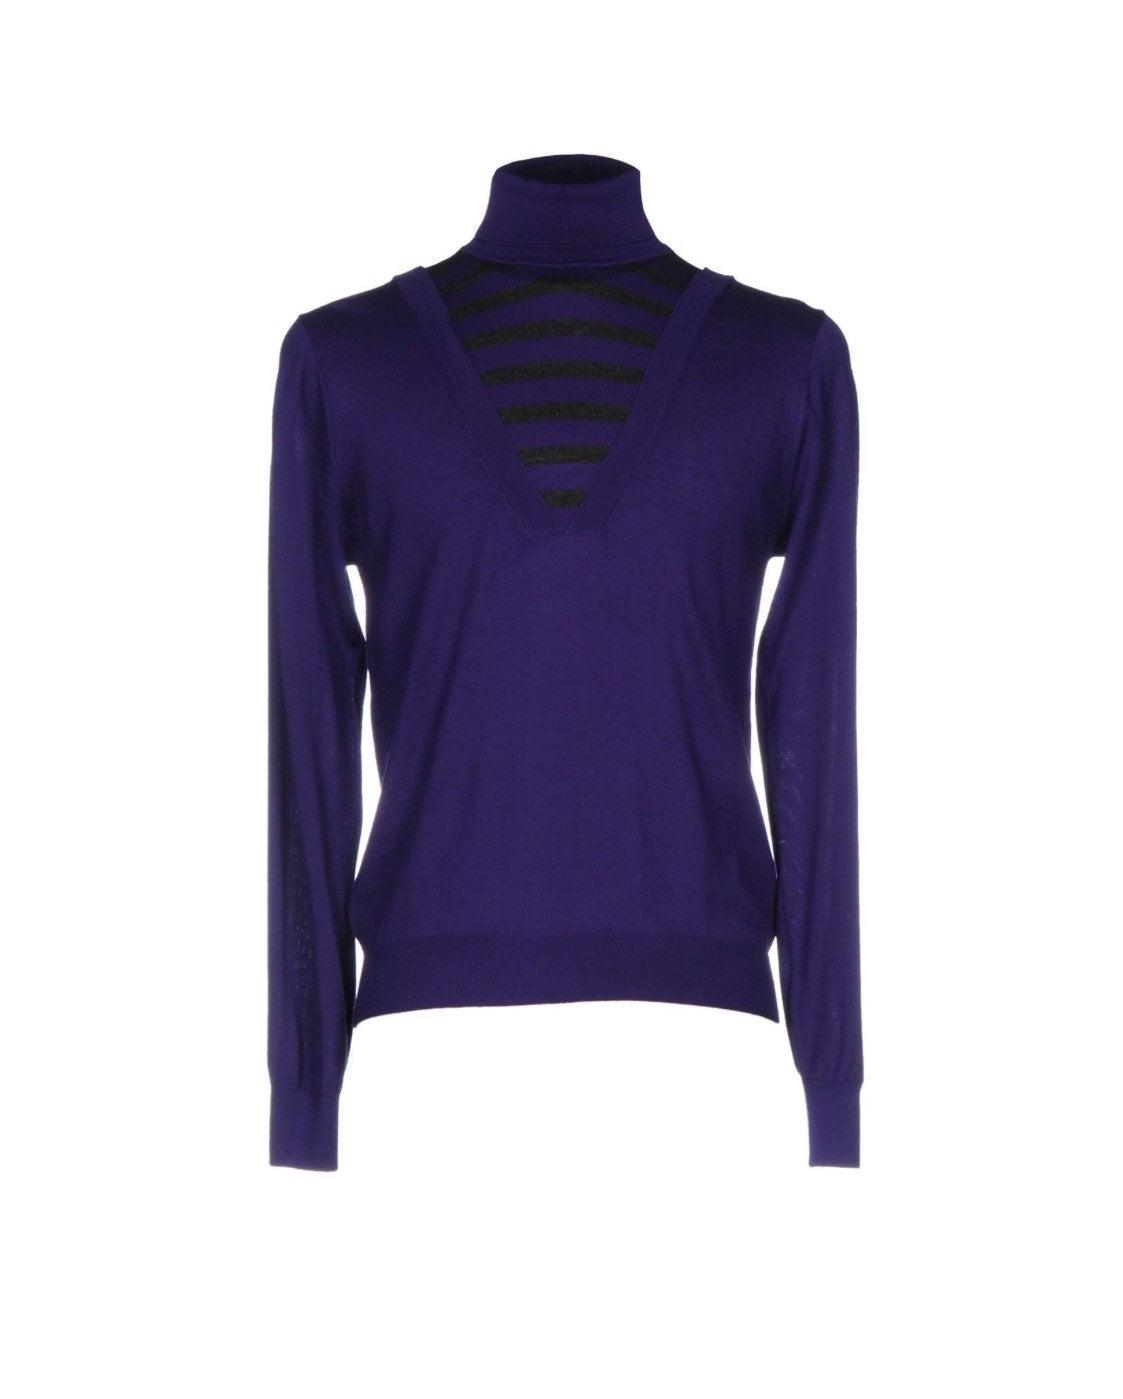 Italian Stylish turtleneck sweater